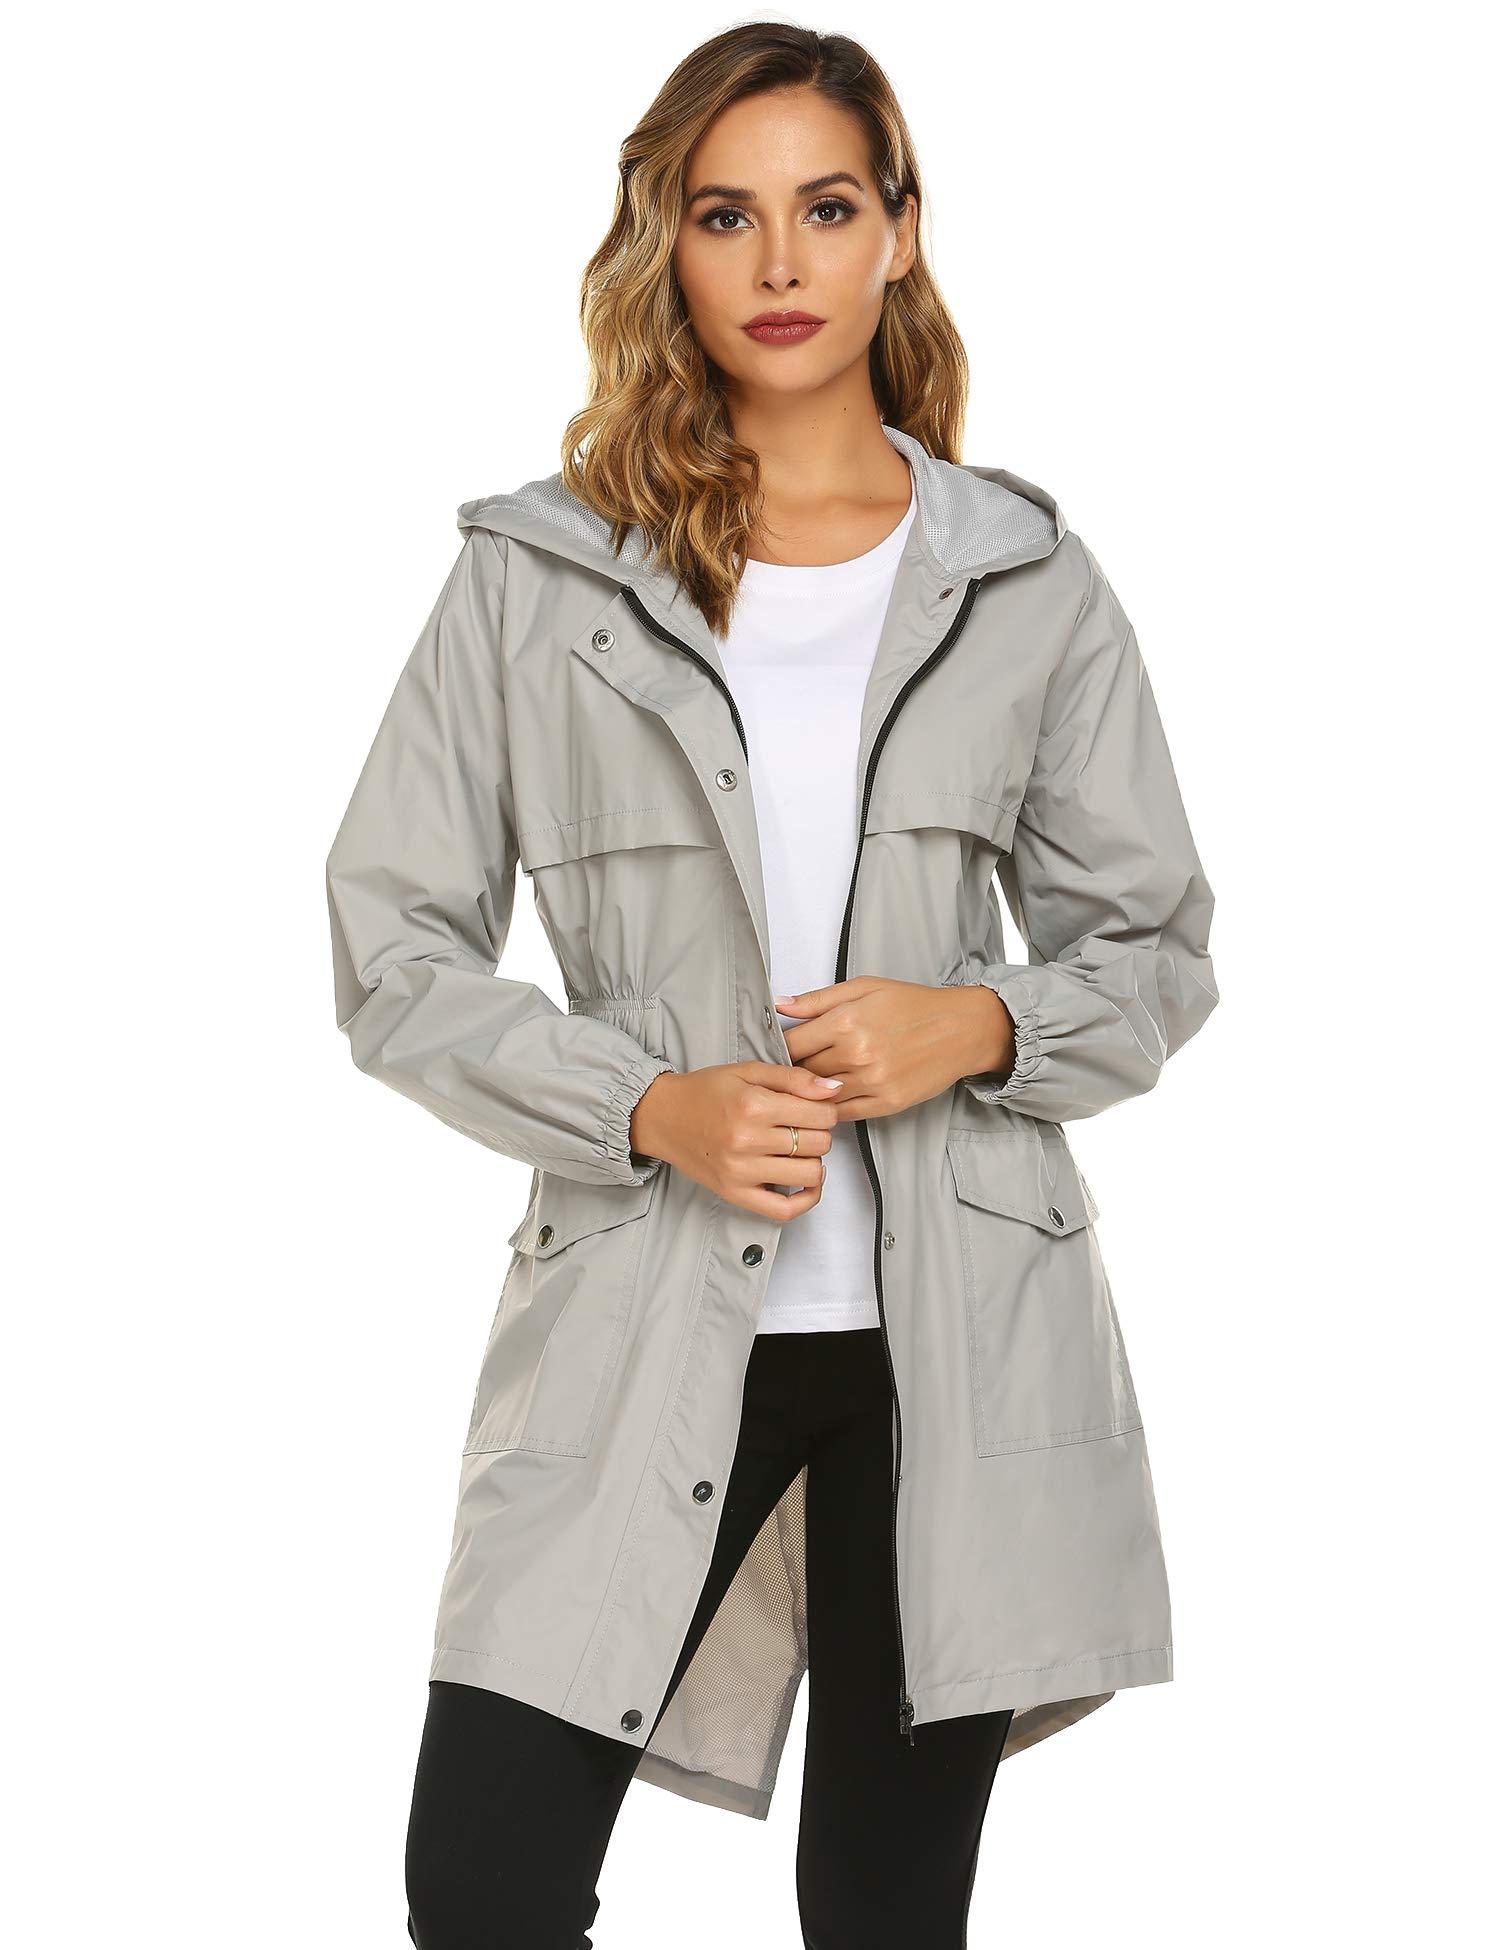 Avoogue Women's Lightweight Rain Jacket Waterproof Active Mesh Hooded Cycling Jacket Grey by Avoogue